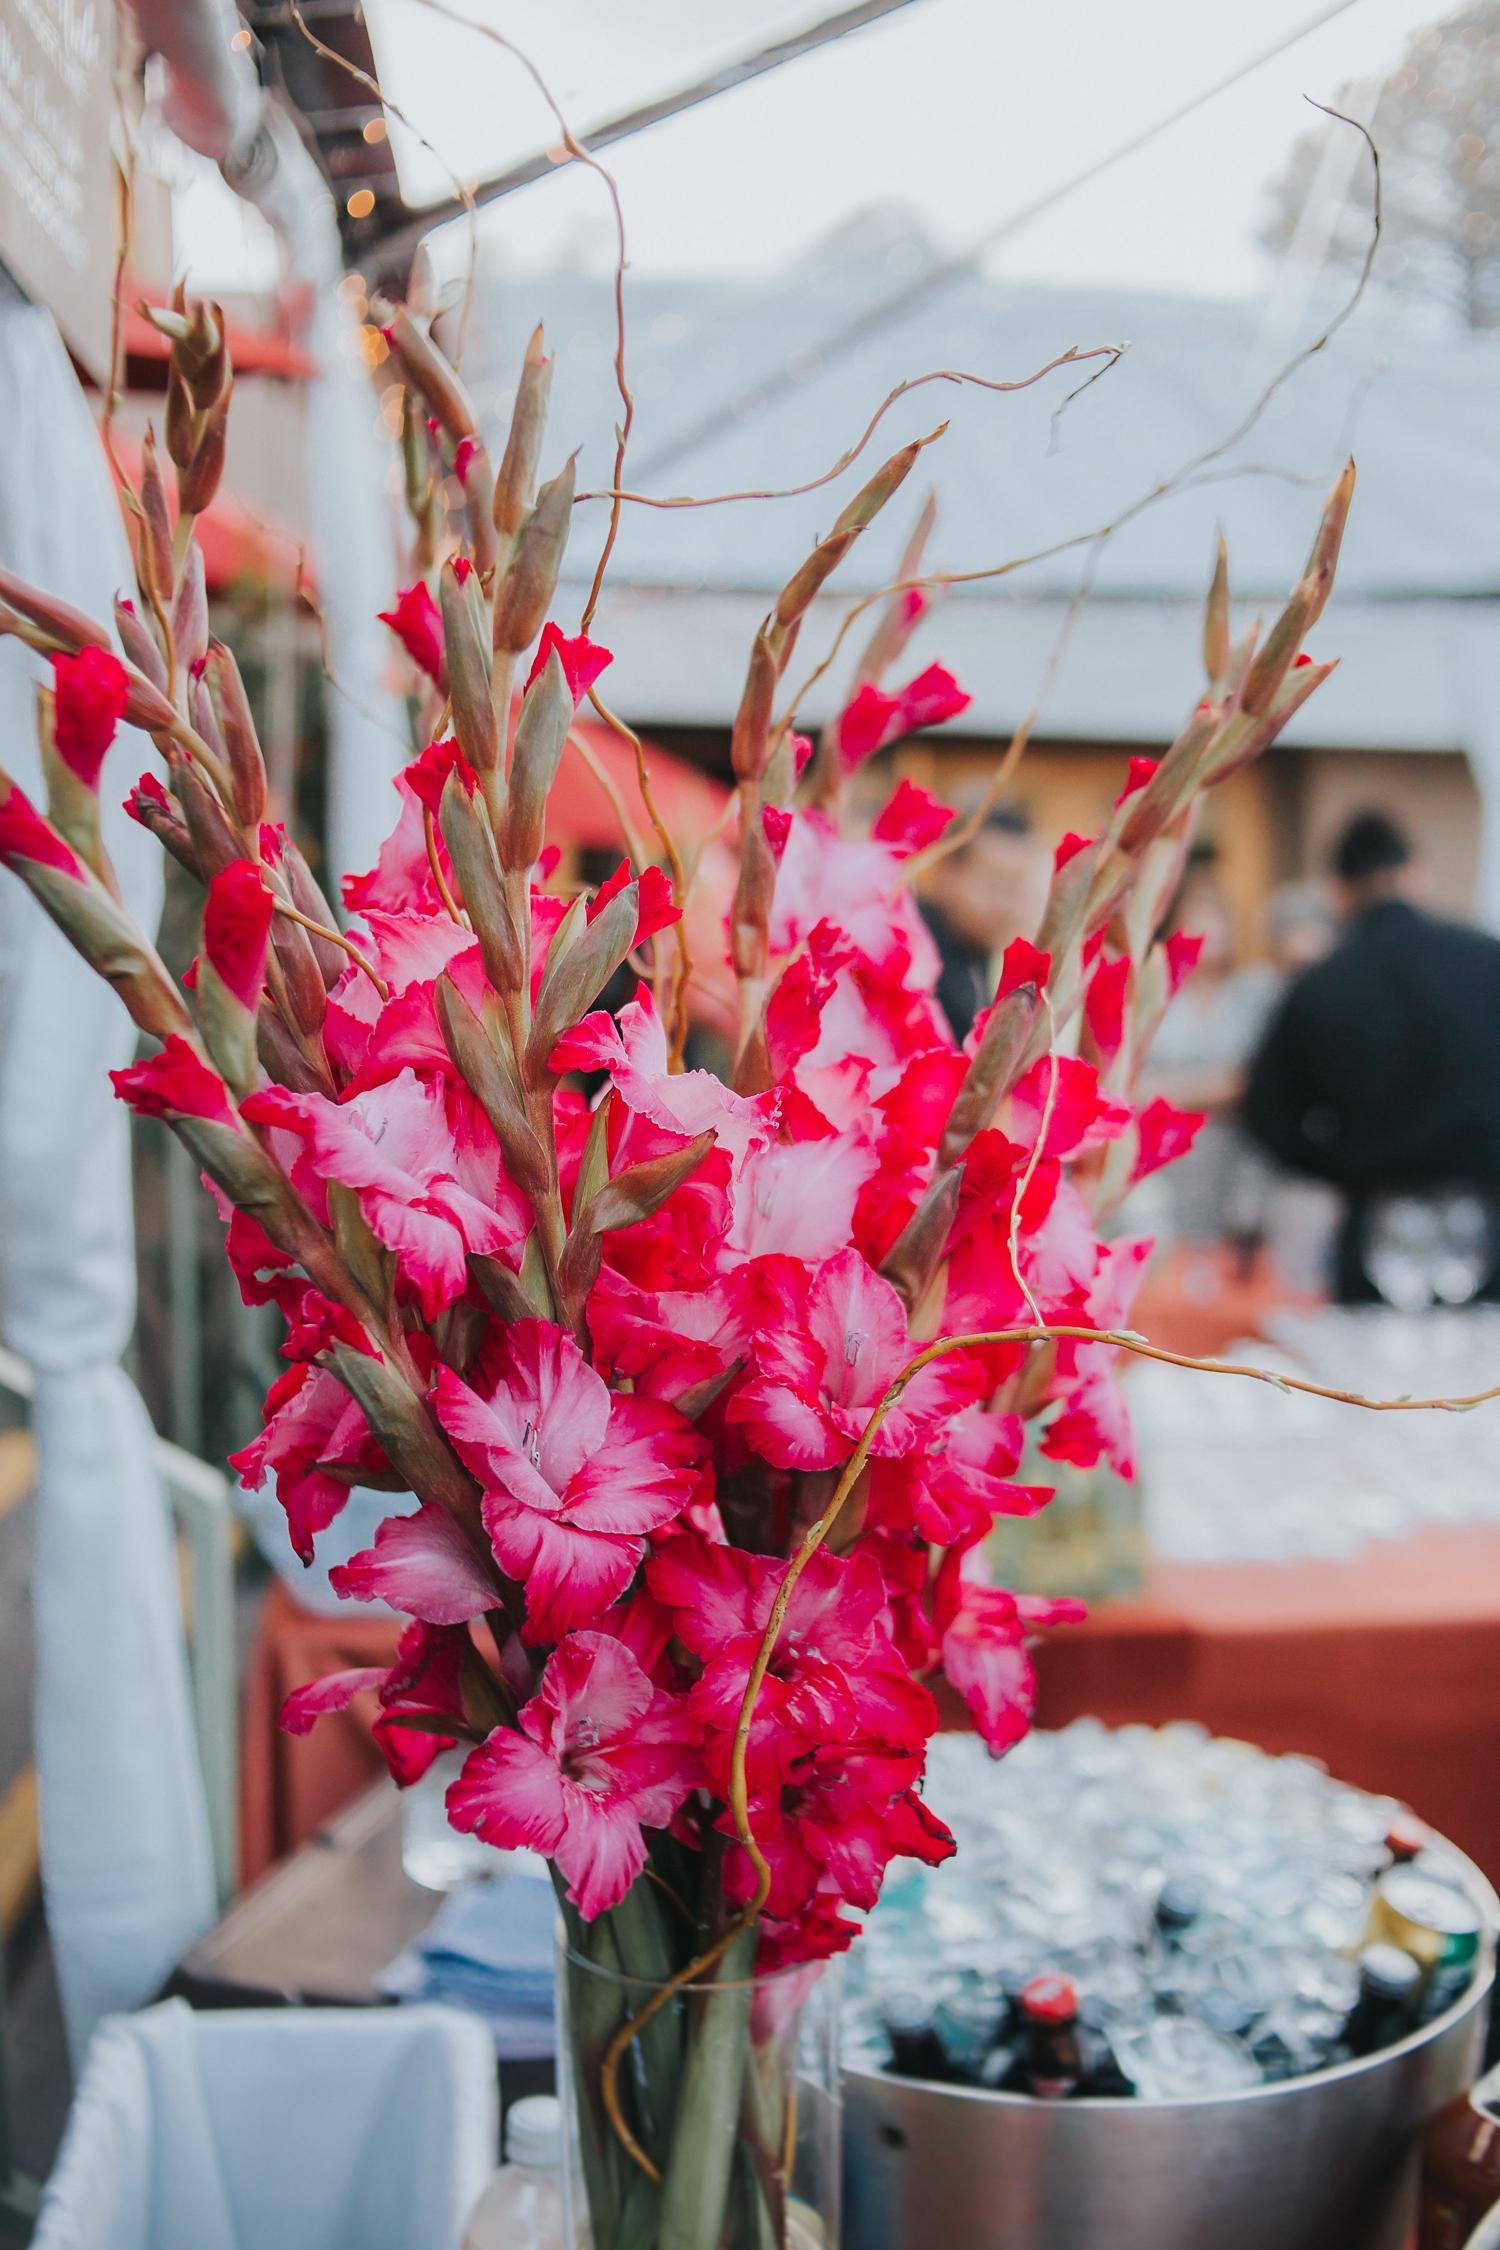 Alicia+lucia+photography+-+albuquerque+wedding+photographer+-+santa+fe+wedding+photography+-+new+mexico+wedding+photographer+-+wedding+flowers+-+summer+wedding+flowers_0004.jpg